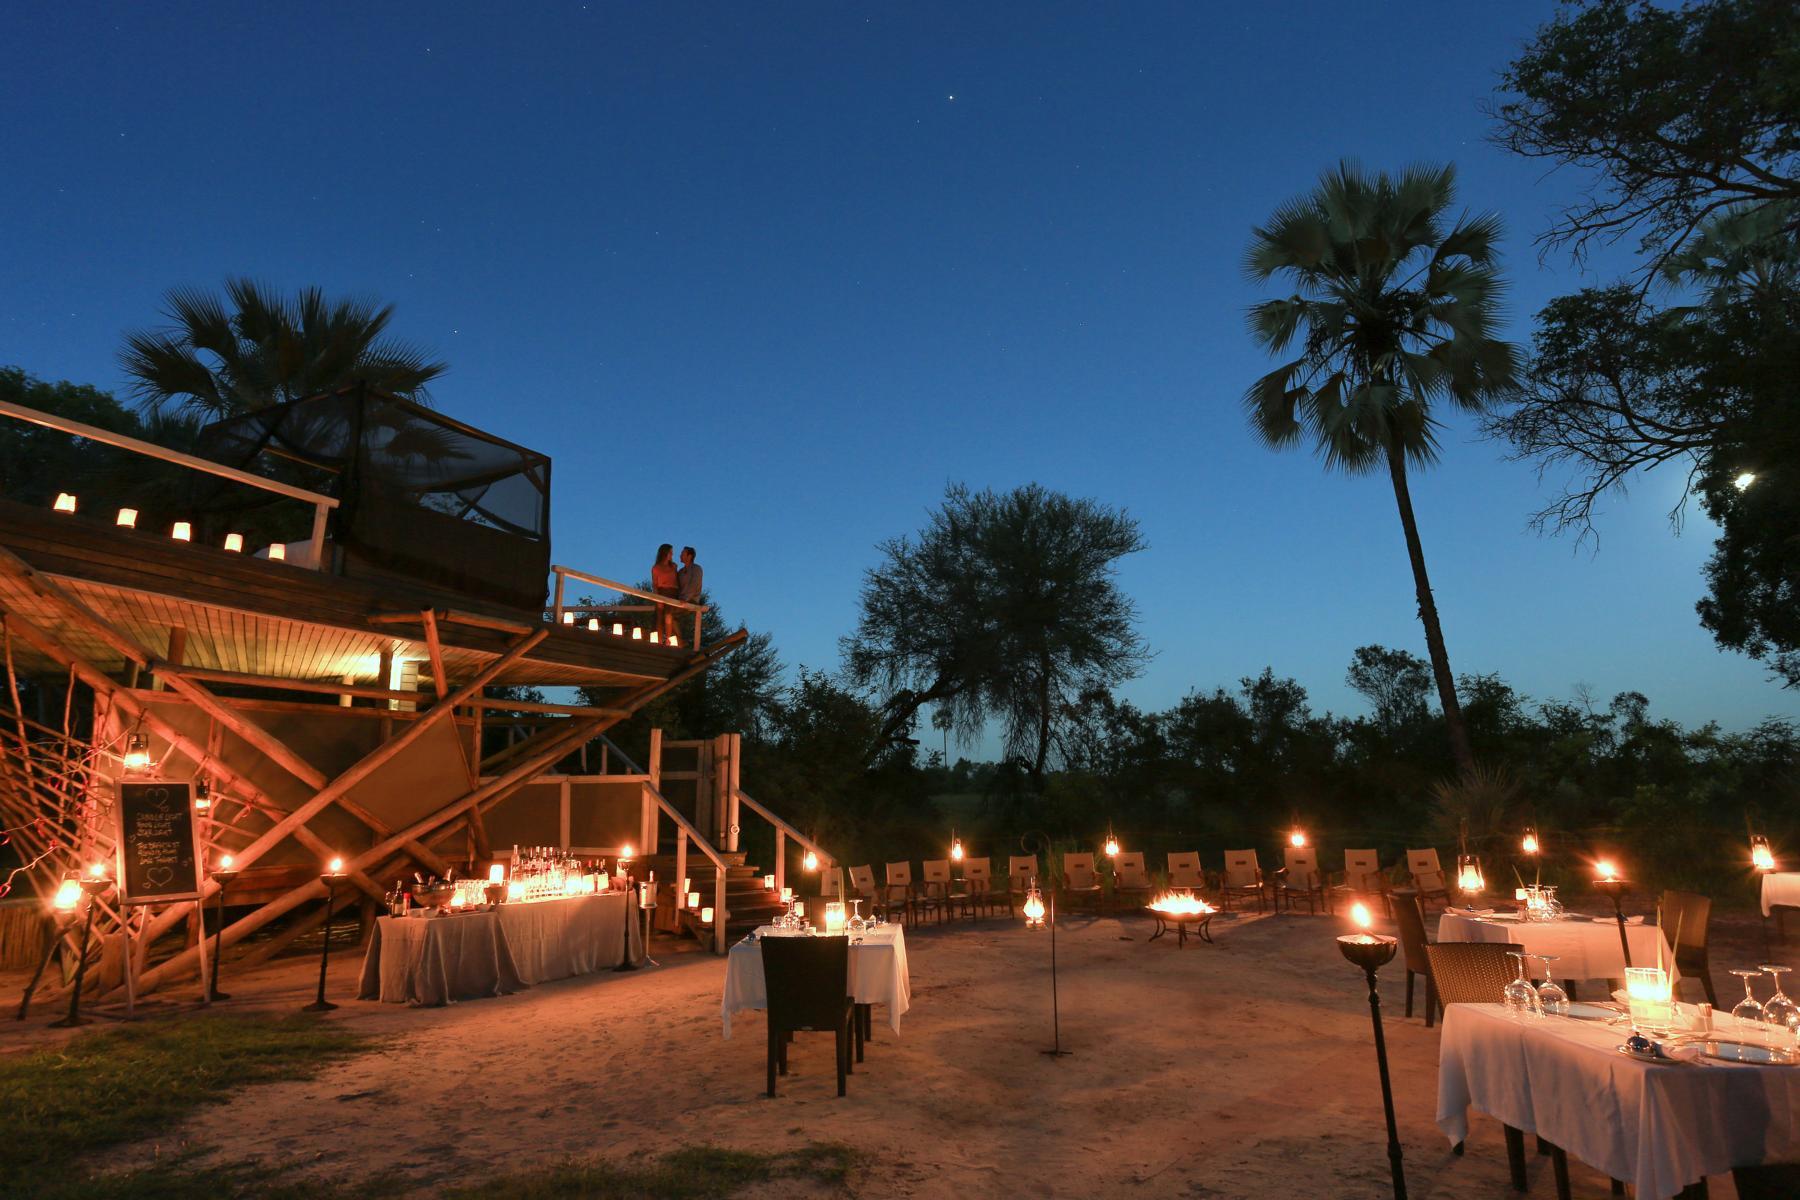 Dinner im Abu Camp, Okavango Delta, Botswana